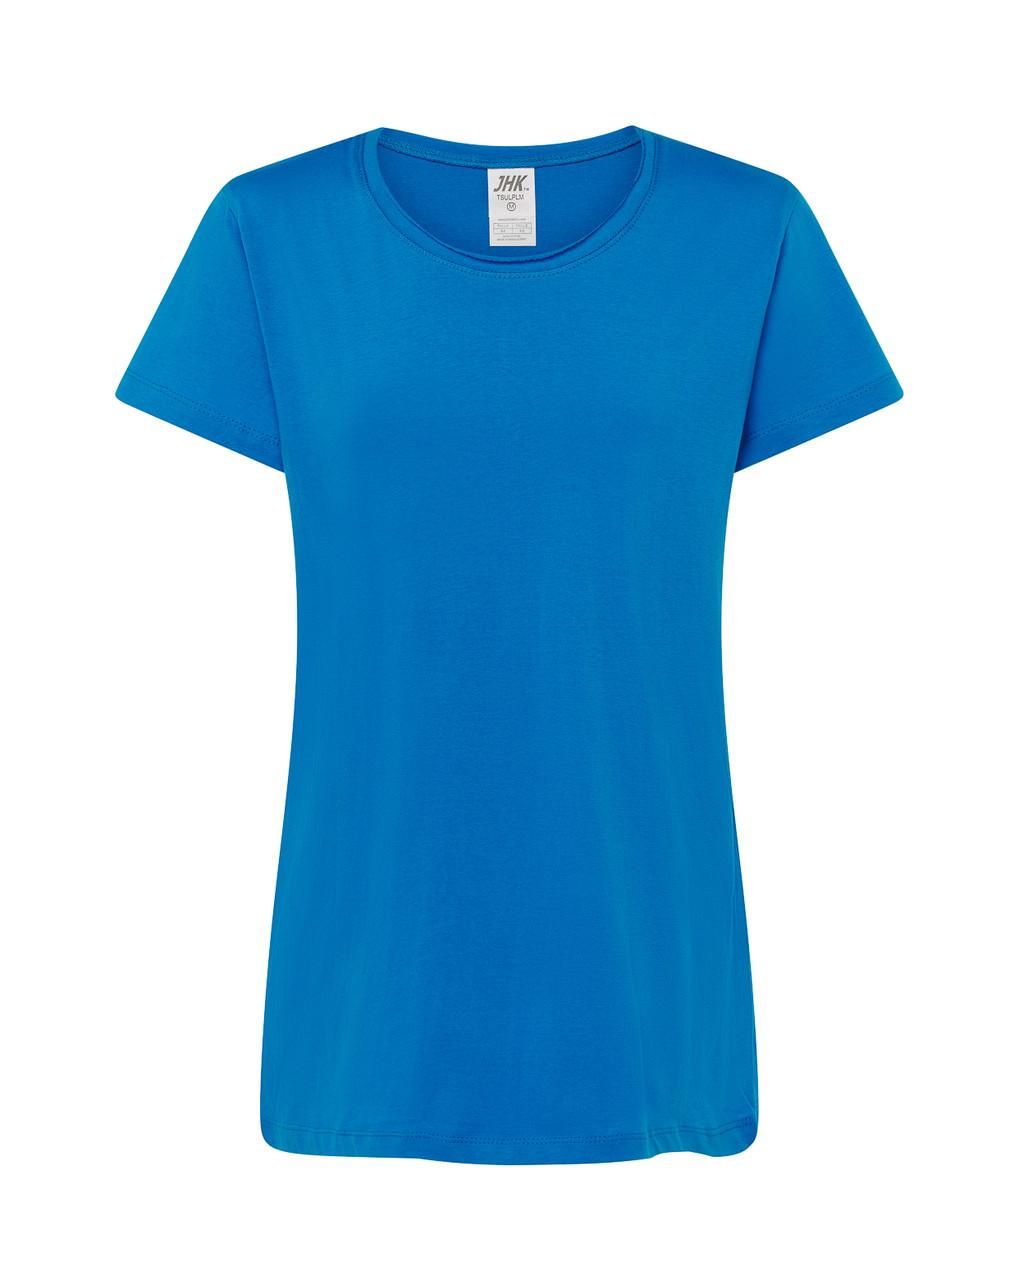 Женская футболка JHK PALMA светло-синий (AQ)